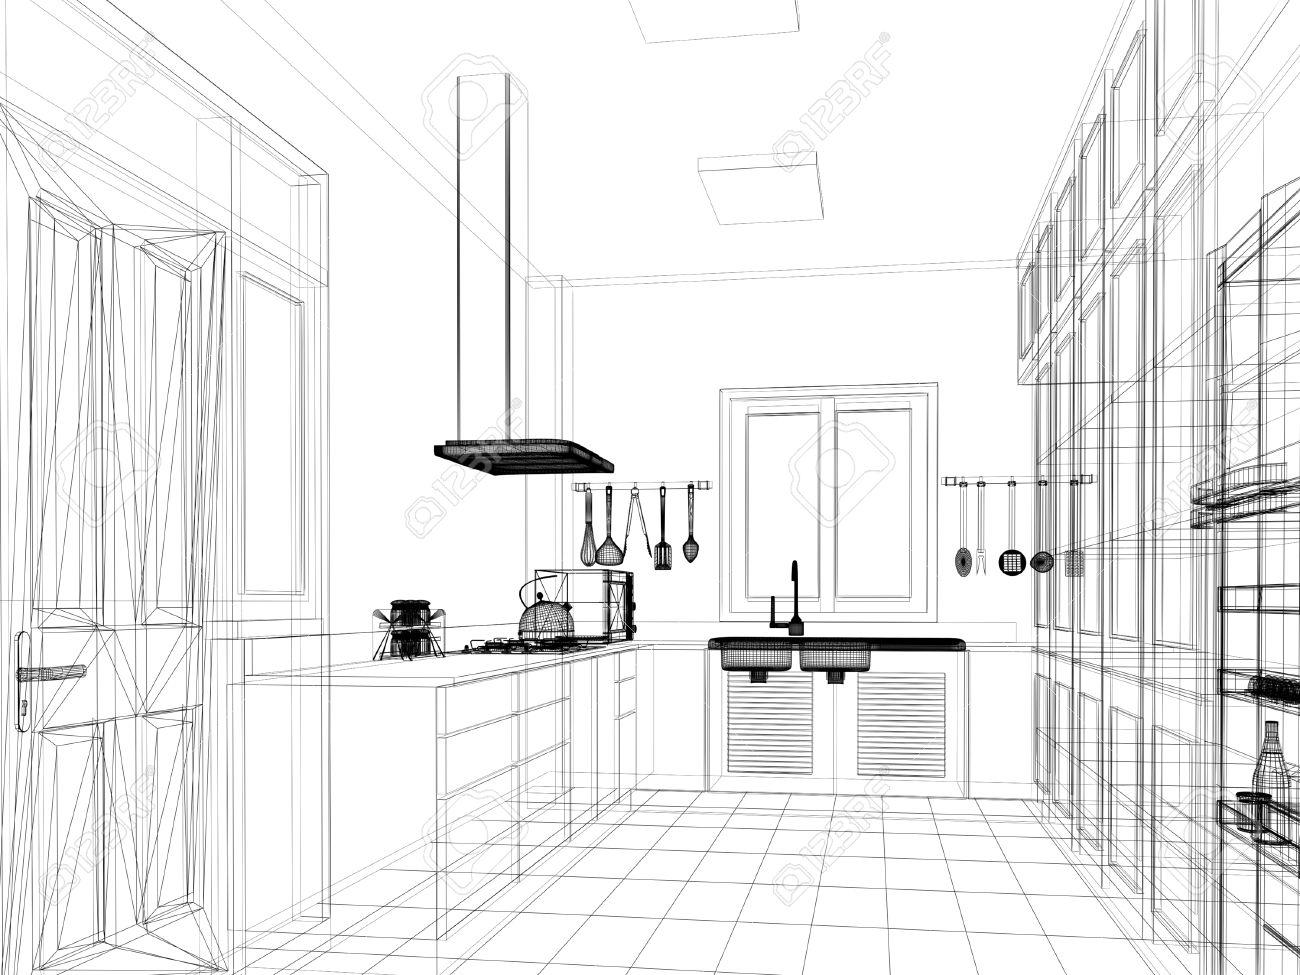 sketch design of interior kitchen Stock Photo - 24519274